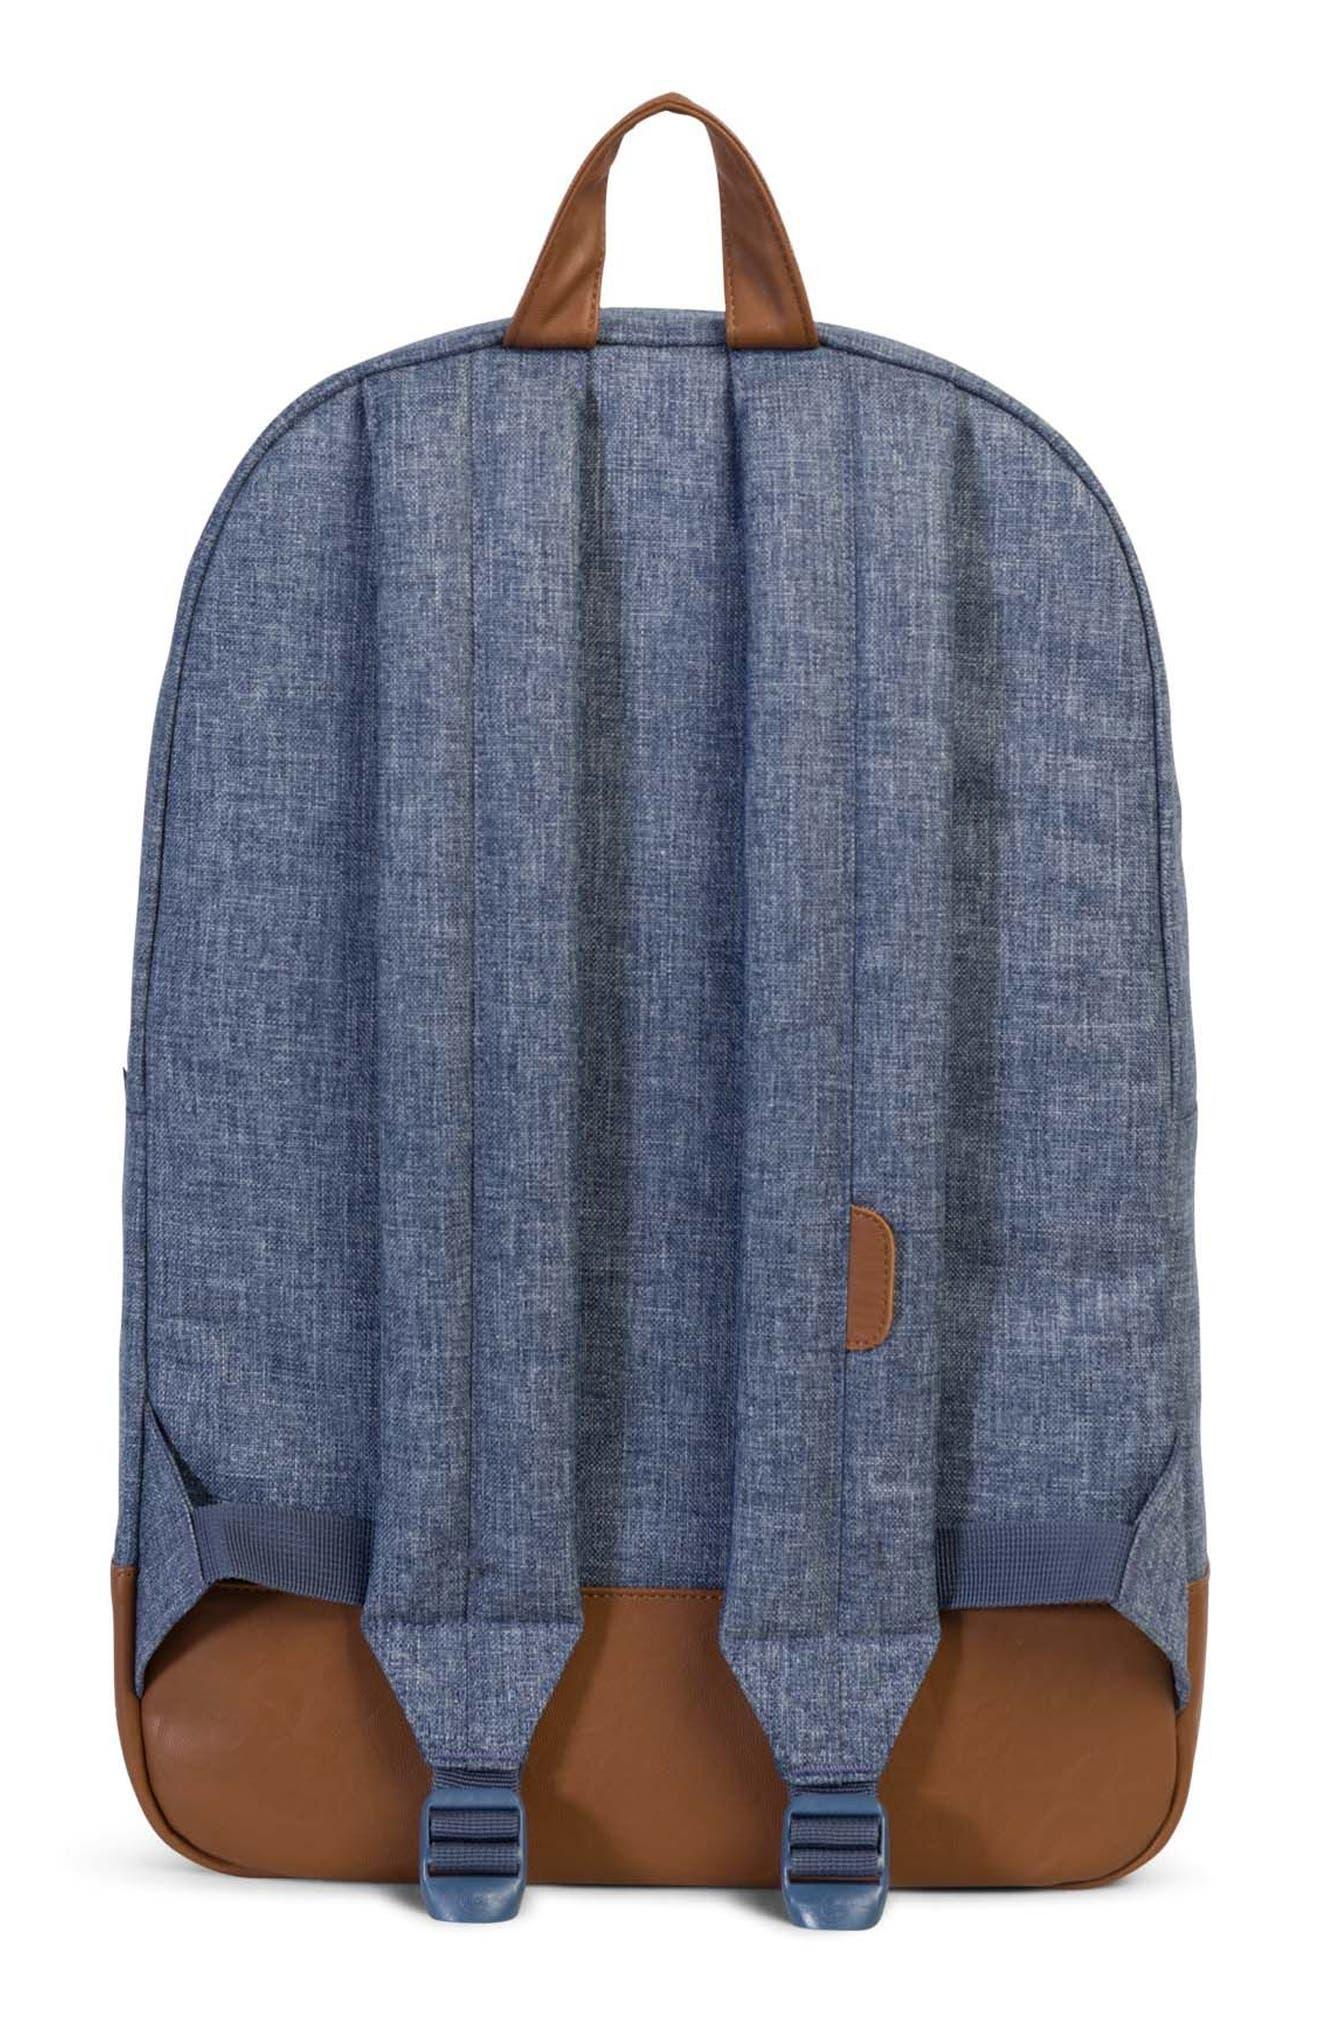 Heritage Backpack,                             Alternate thumbnail 2, color,                             Dark Blue Crosshatch/ Tan